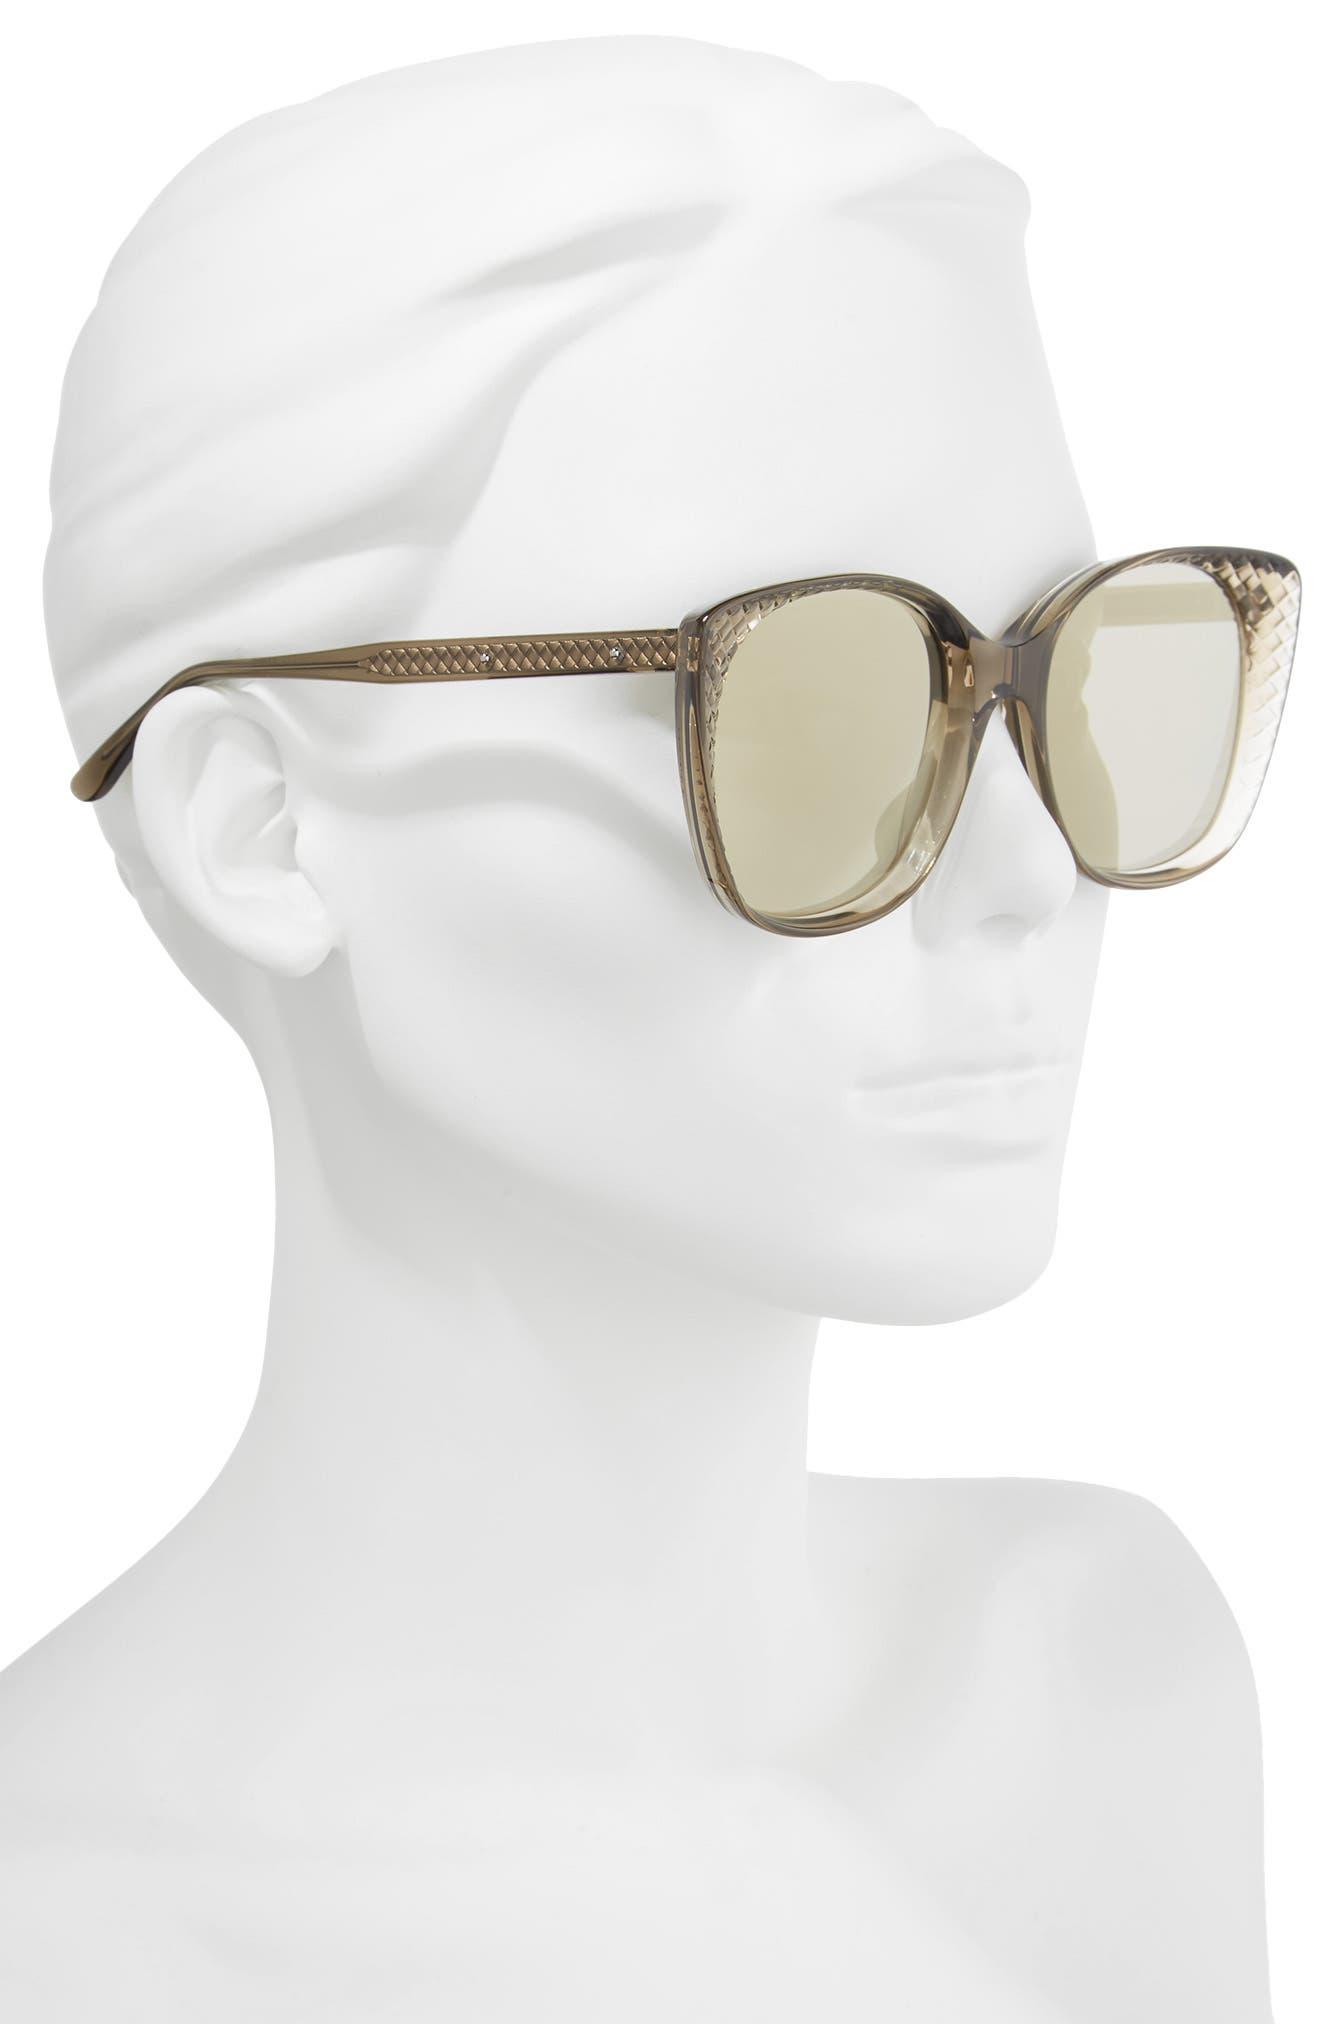 54mm Sunglasses,                             Alternate thumbnail 2, color,                             BROWN